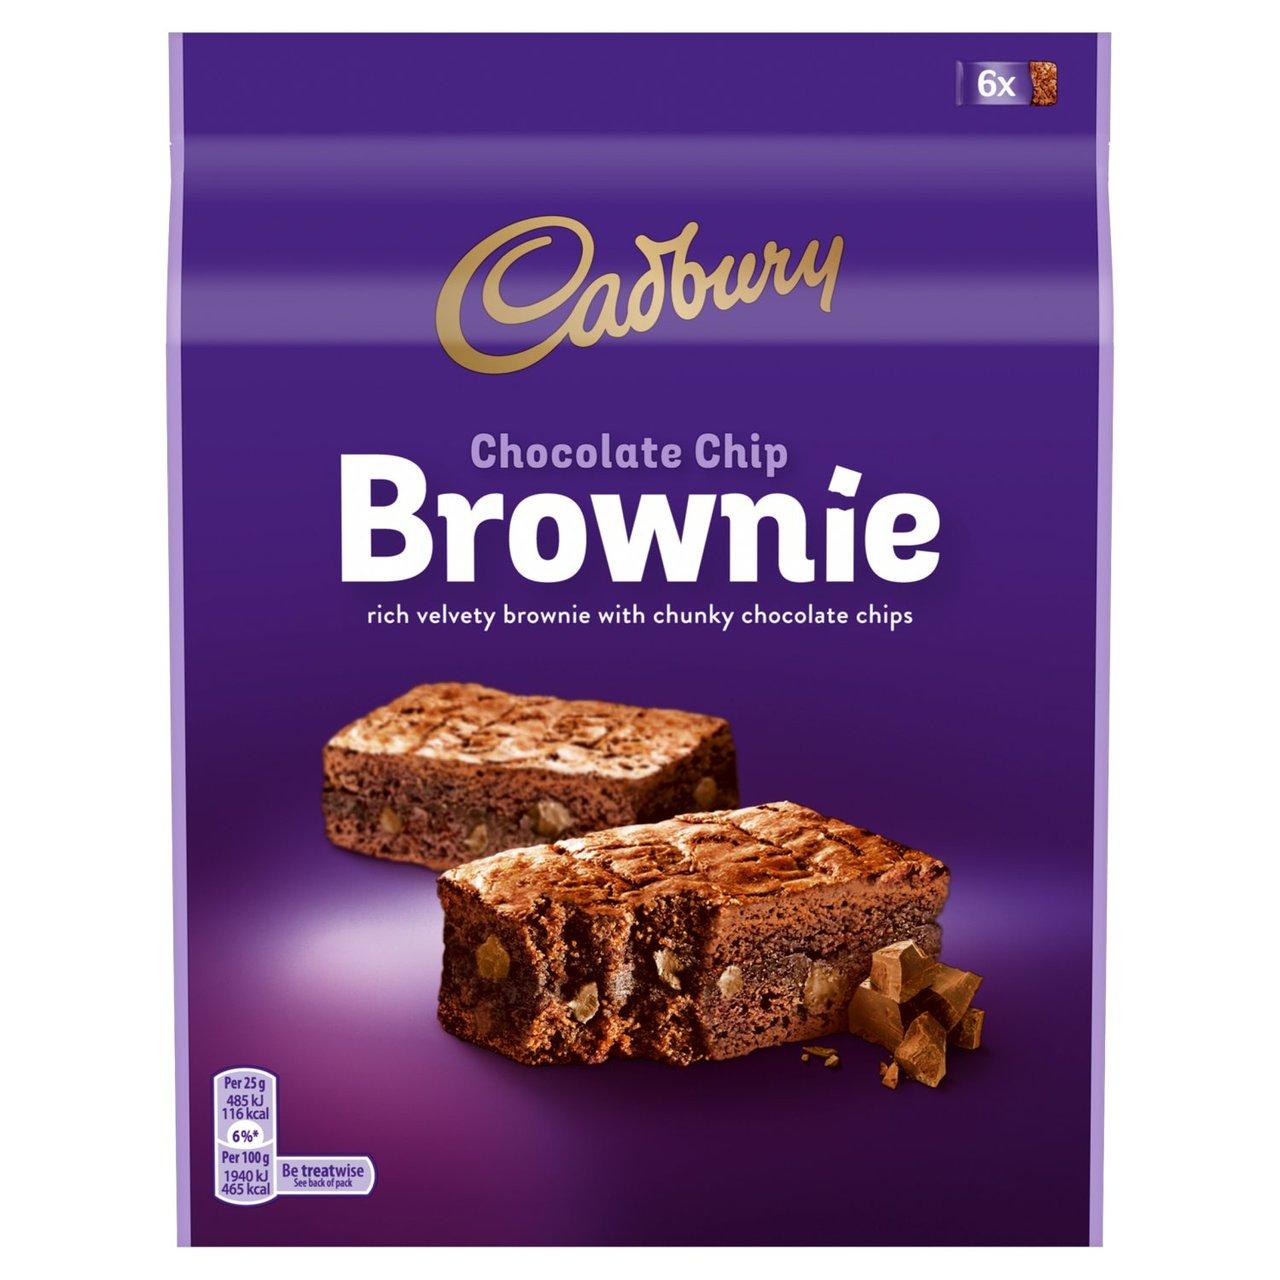 Cadbury Chocolate Chip Brownie 6 pack 150g - £1.50 @ Morrisons